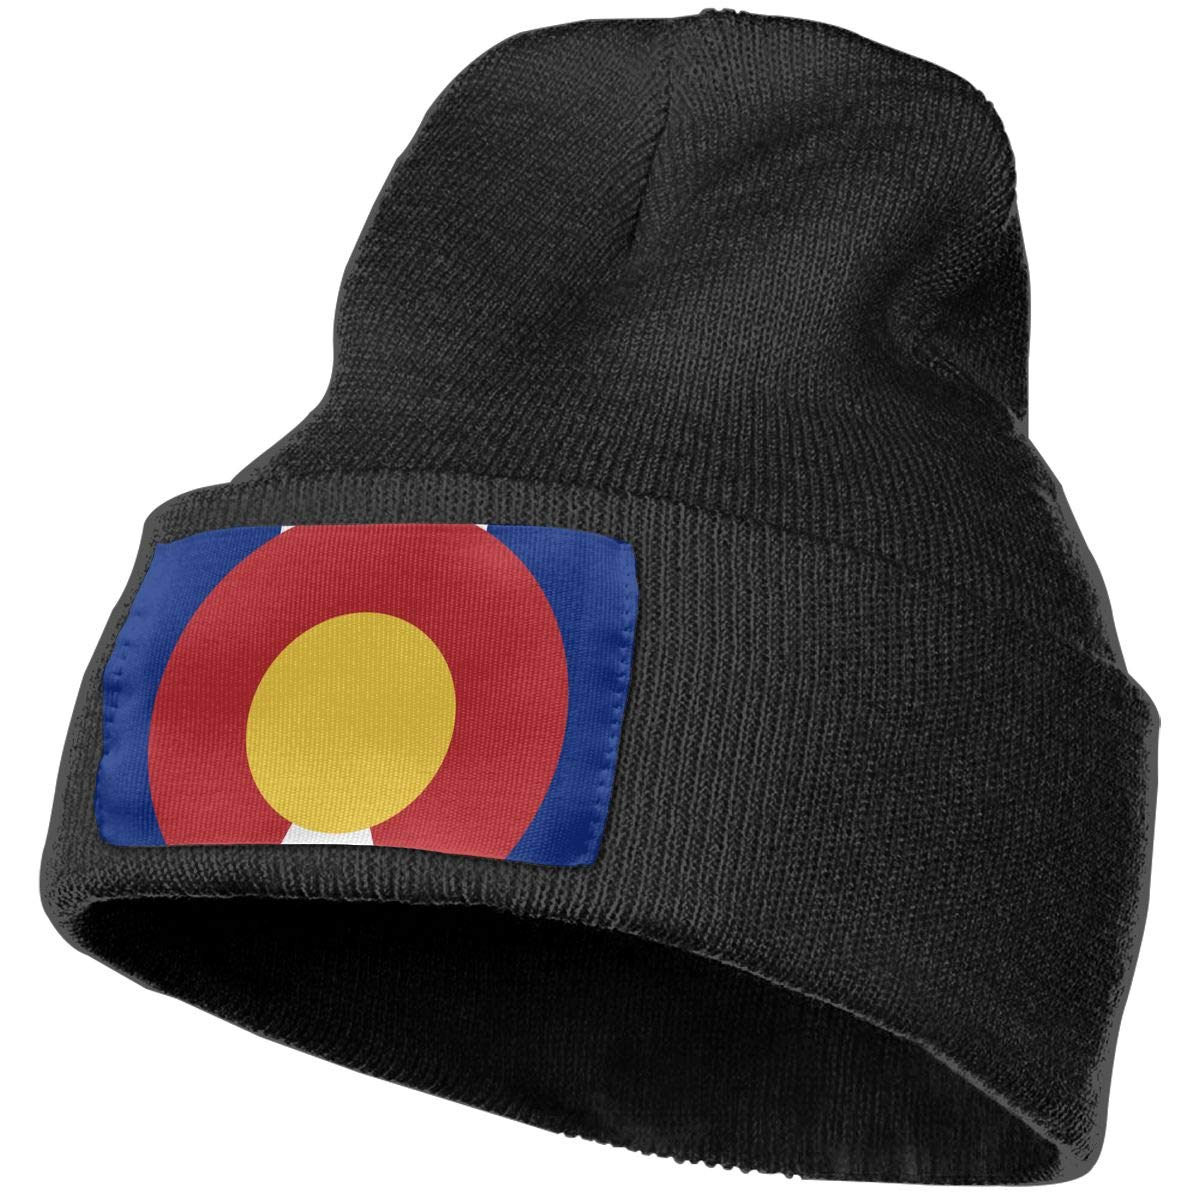 Sheery Colorado State Flag Casual Knit Cap for Men Women 100/% Acrylic Acid Skull Cap Woolen Hat